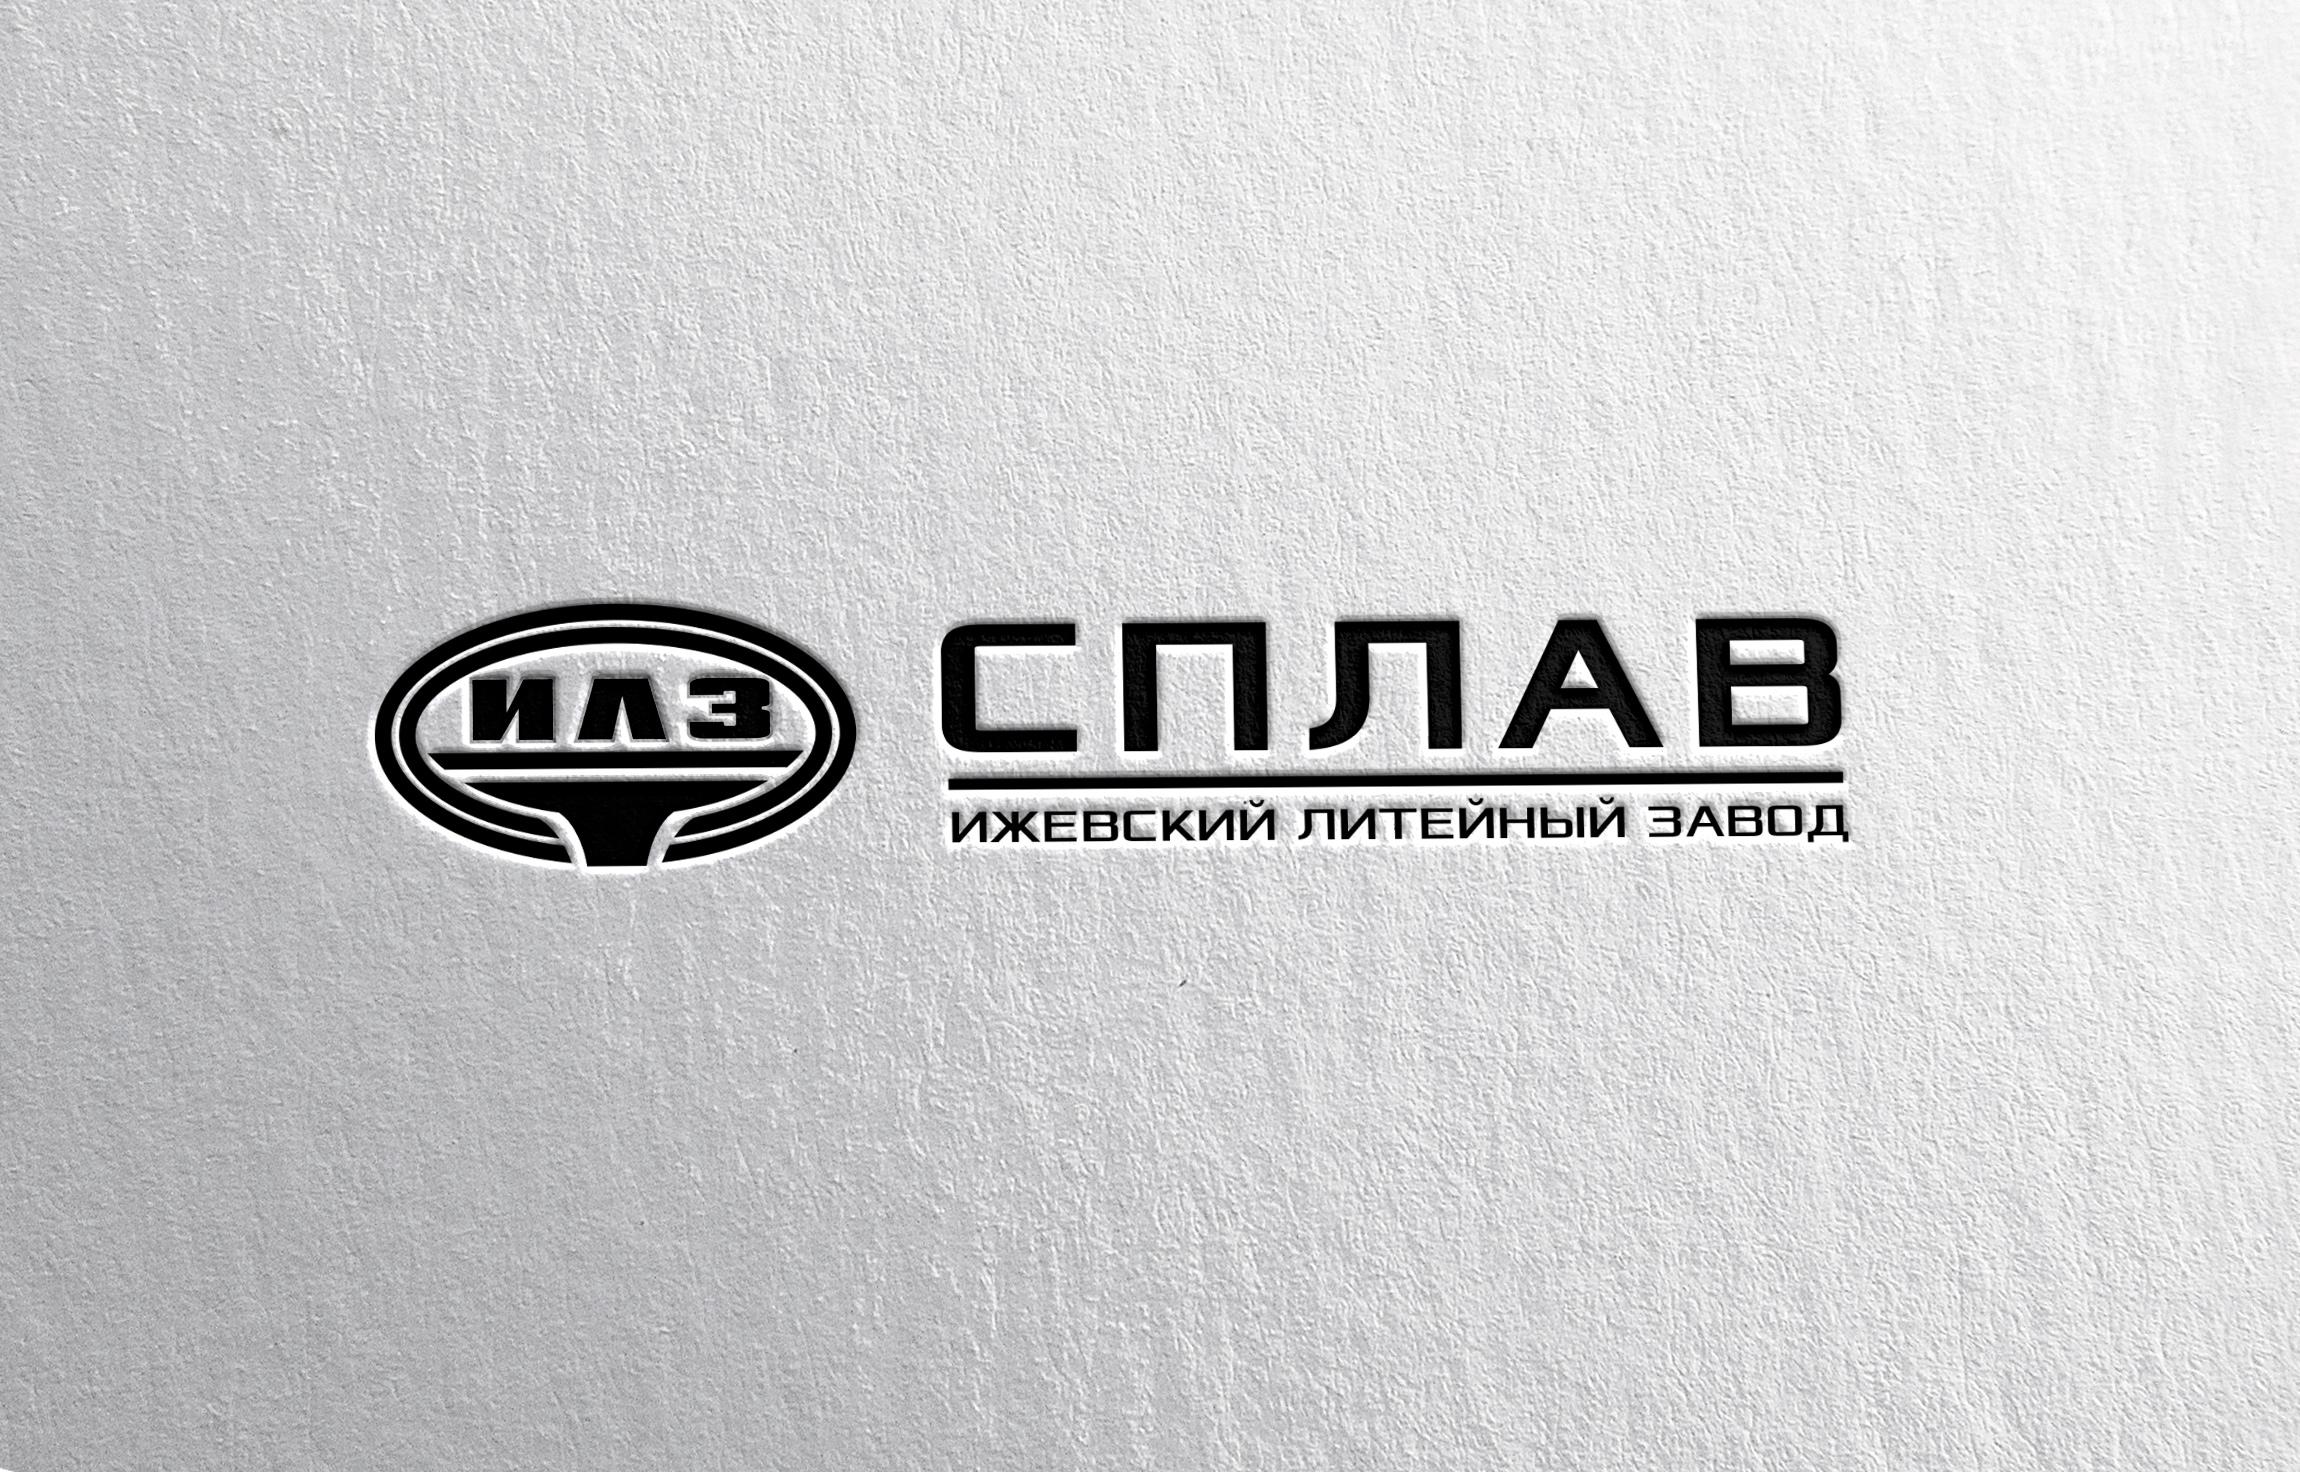 Разработать логотип для литейного завода фото f_8905b0d936ea0c75.jpg